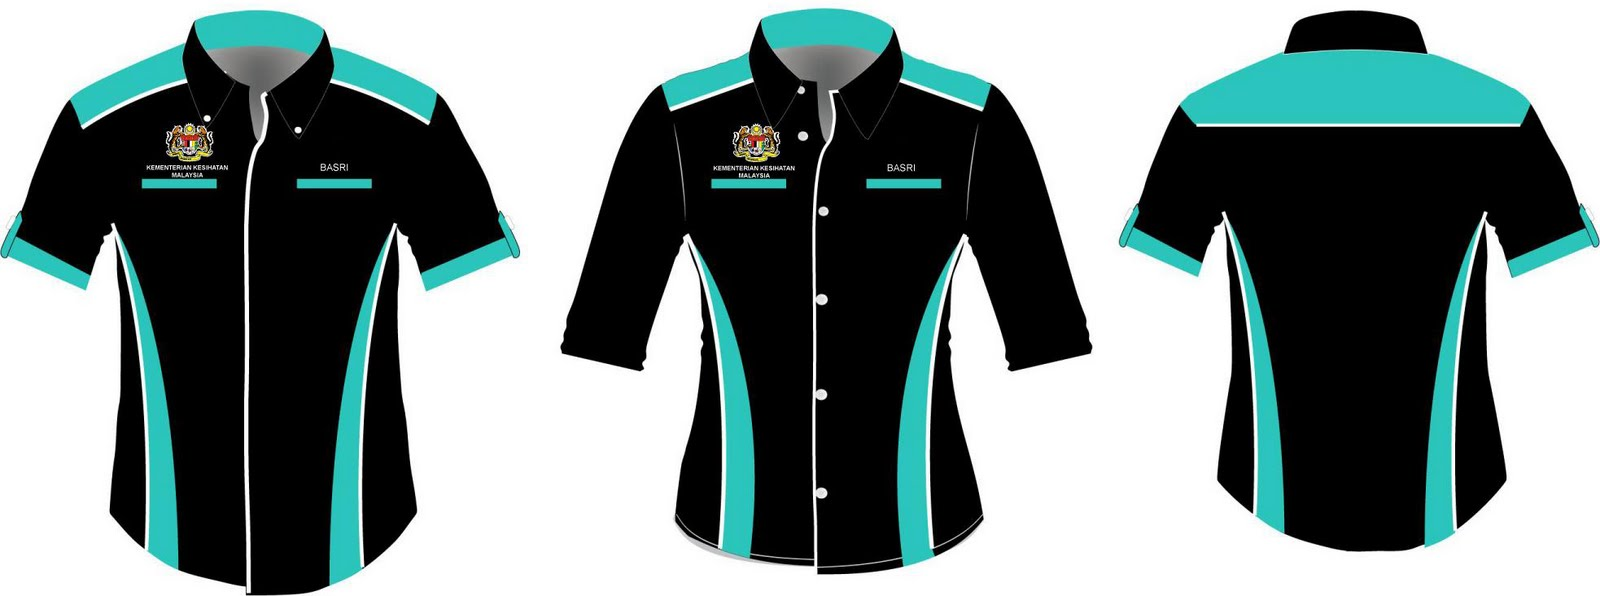 Corporate T Shirt Design Ideas